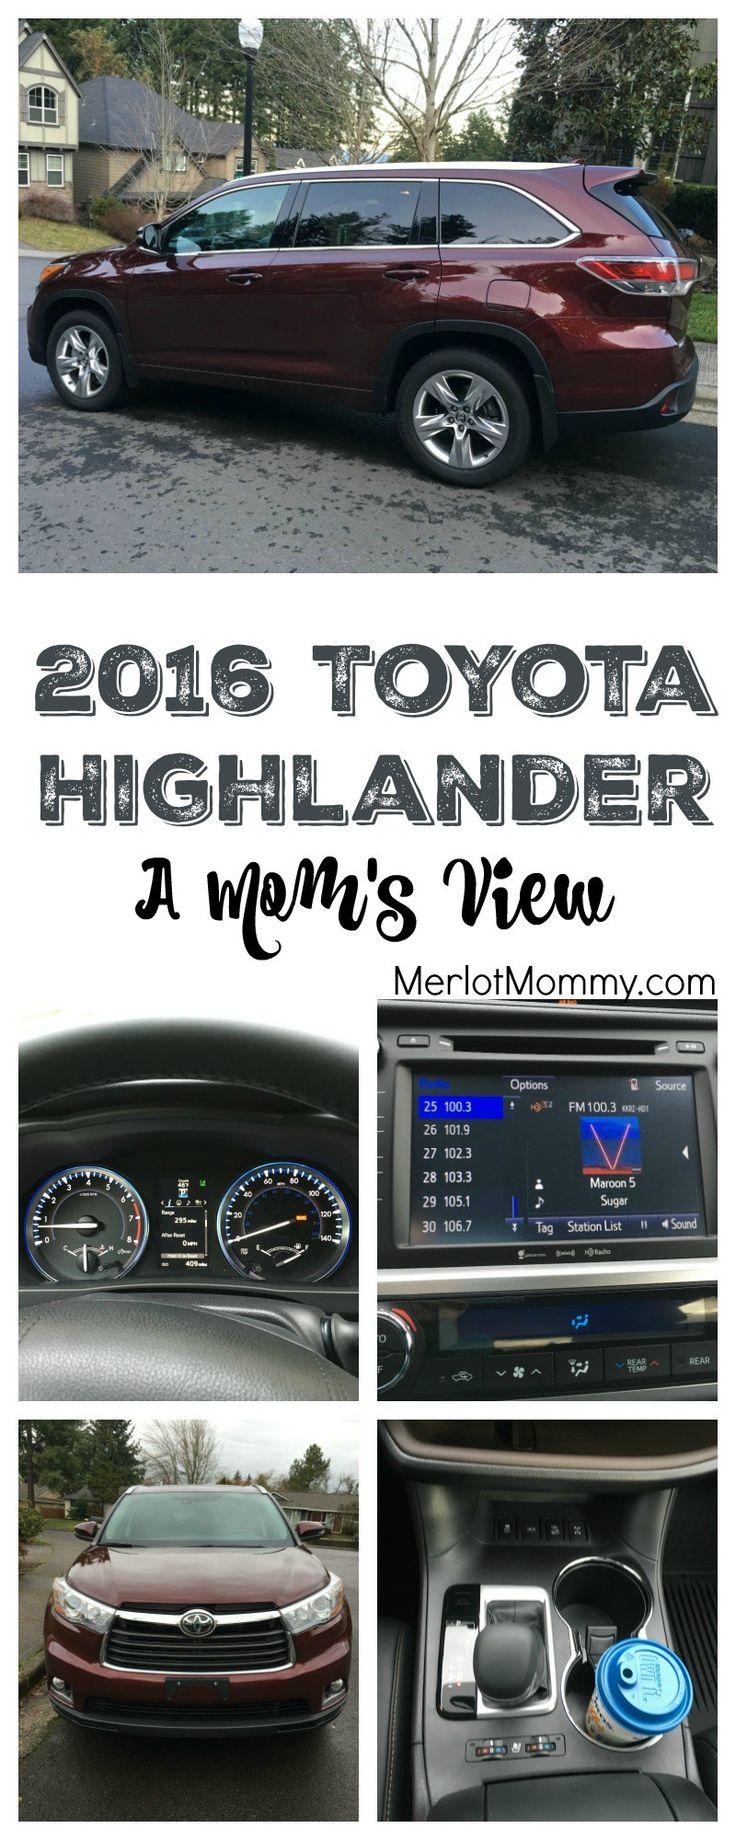 2016 Toyota Highlander: A Mom's View